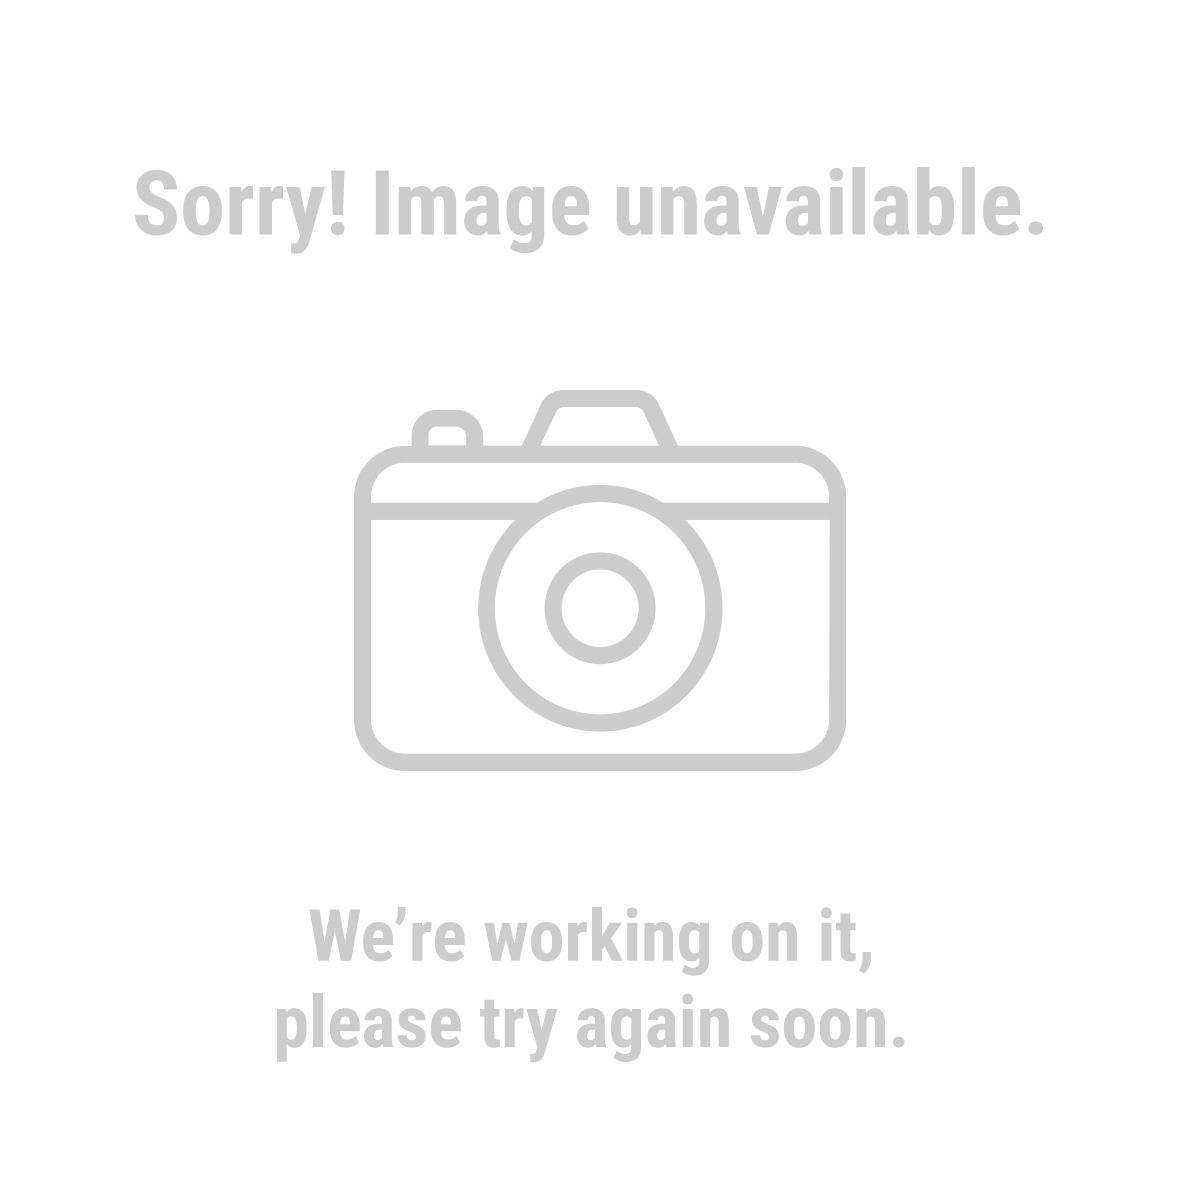 "Gordon 98506 6-3/4"" 109 LED Flashlight"